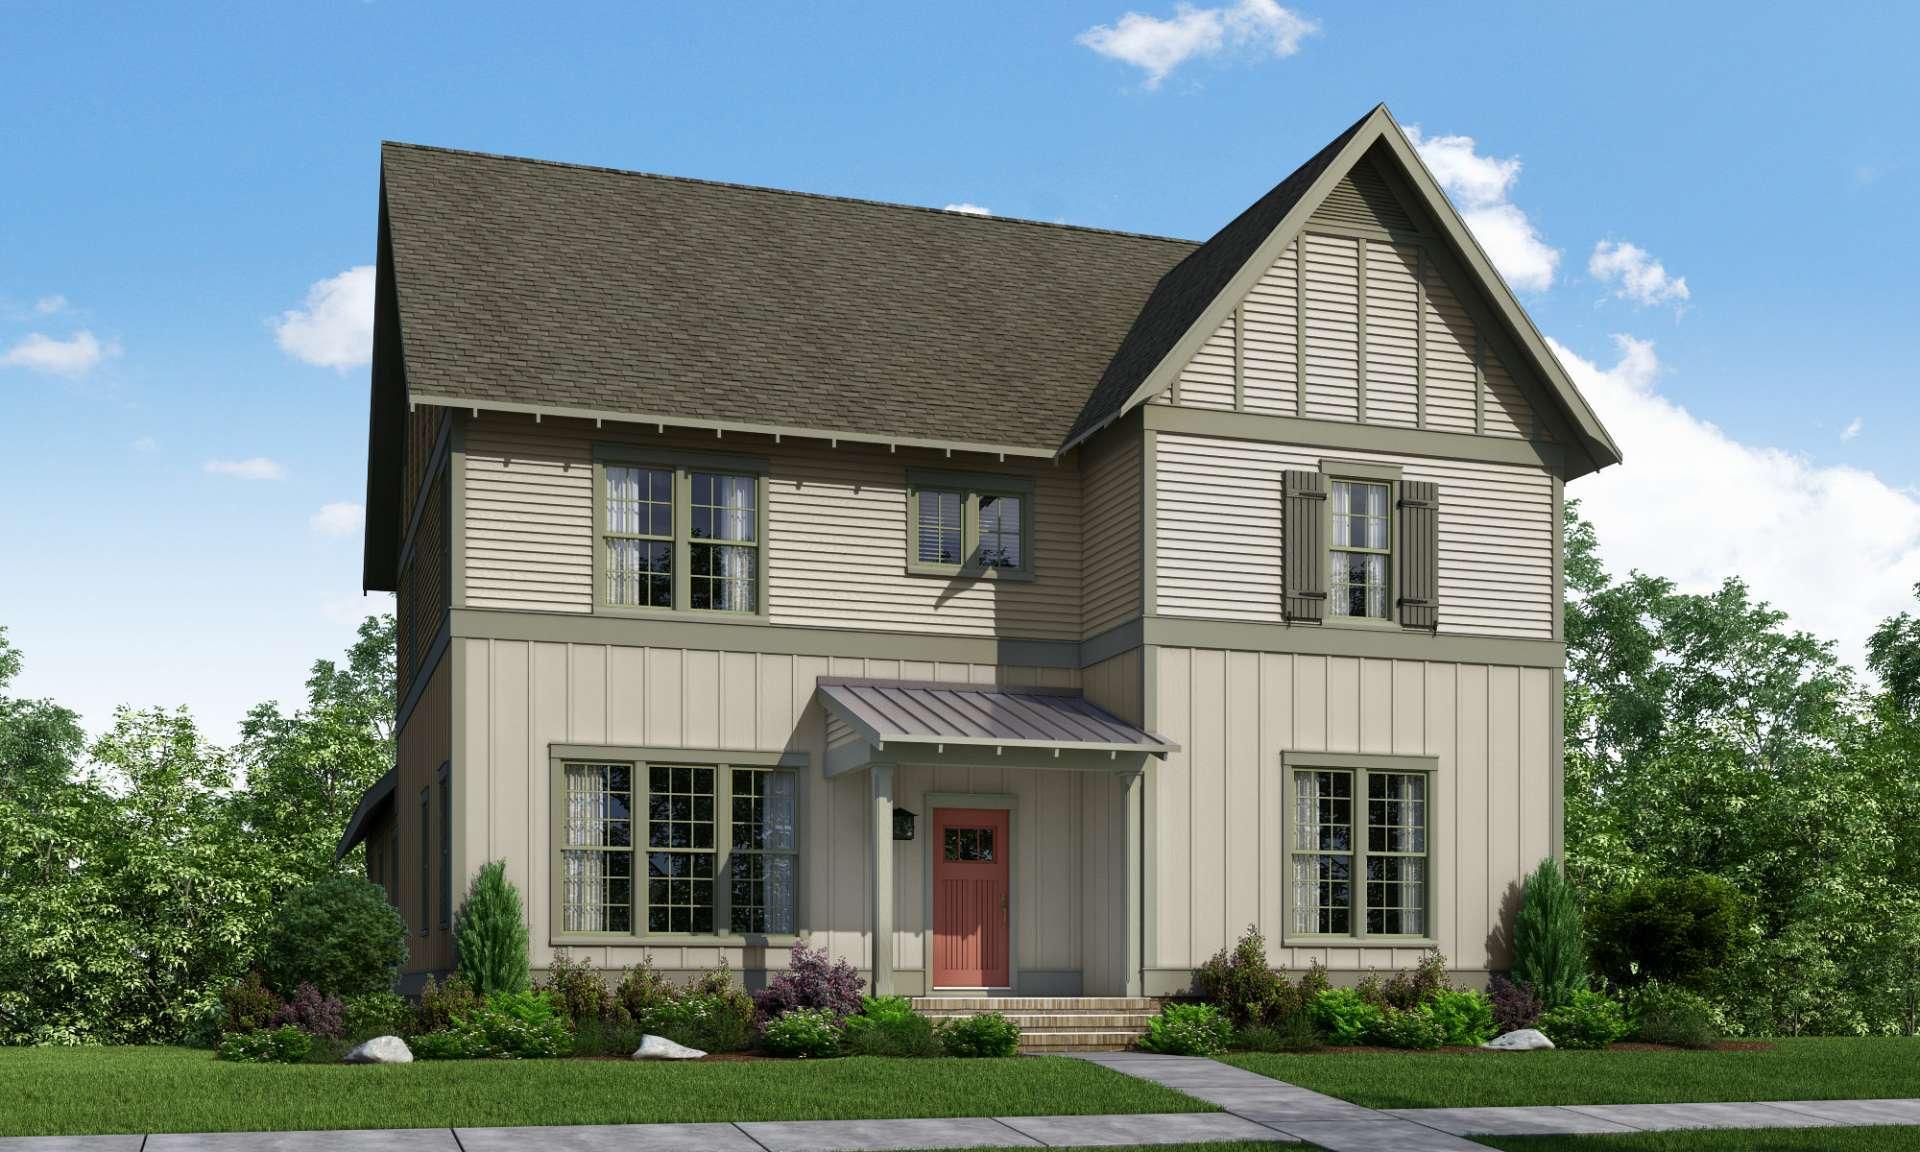 Single Family for Sale at Altadena Ridge - Floyd A Birmingham, Alabama 35243 United States